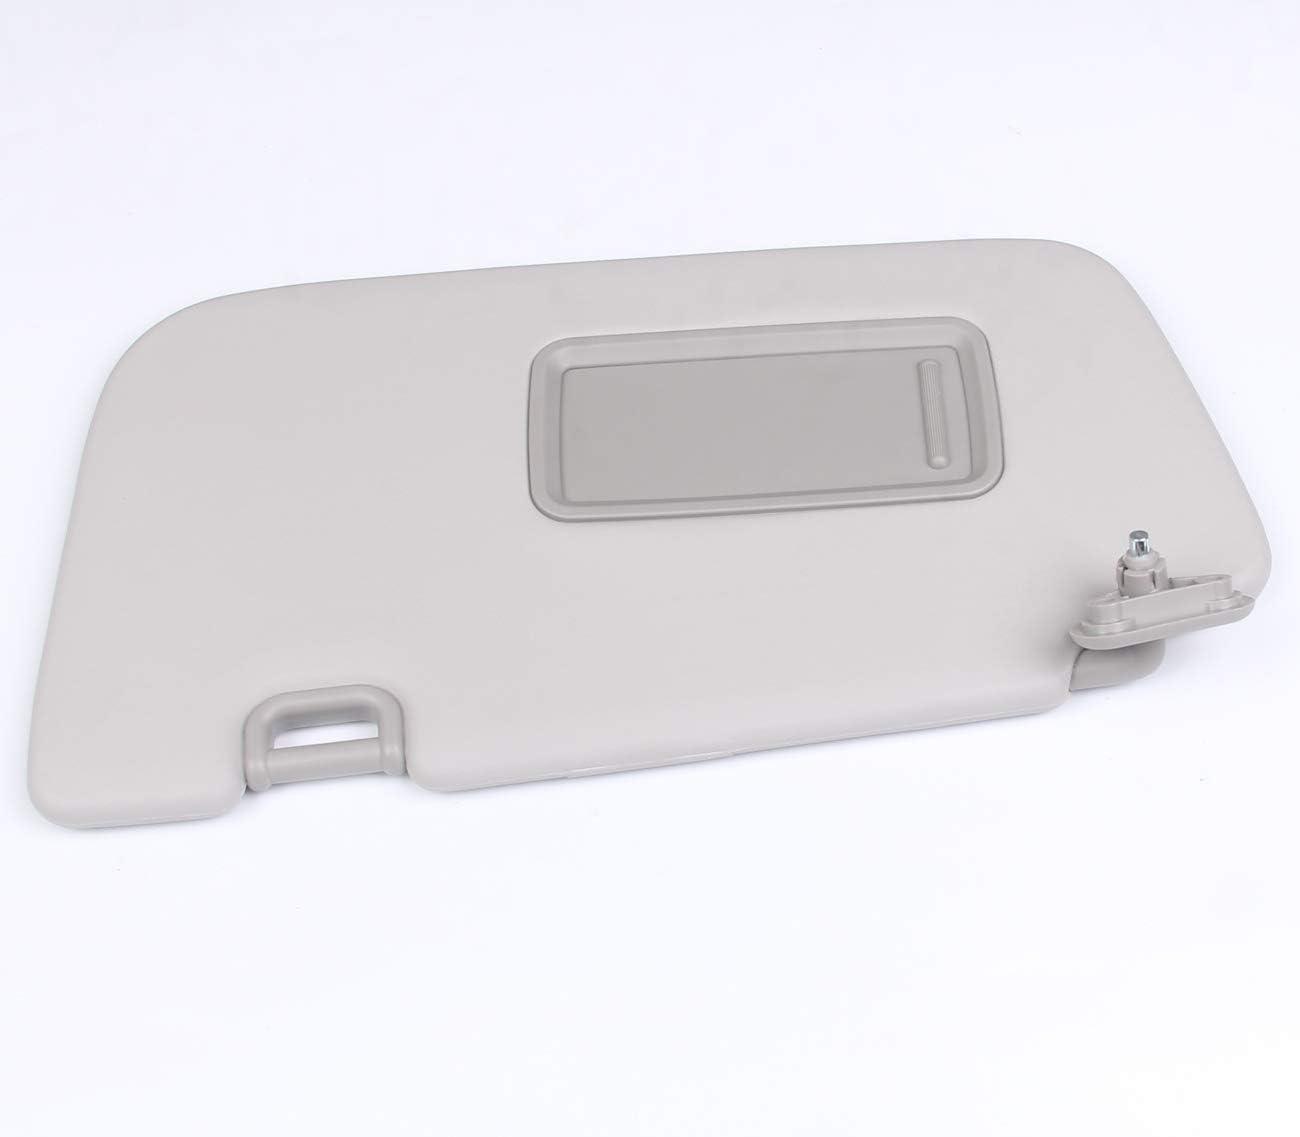 New Left Driver Side Sun Visor with Light For Subaru Impreza WRX STI 2008-2014 Replace # 92011FG032ME